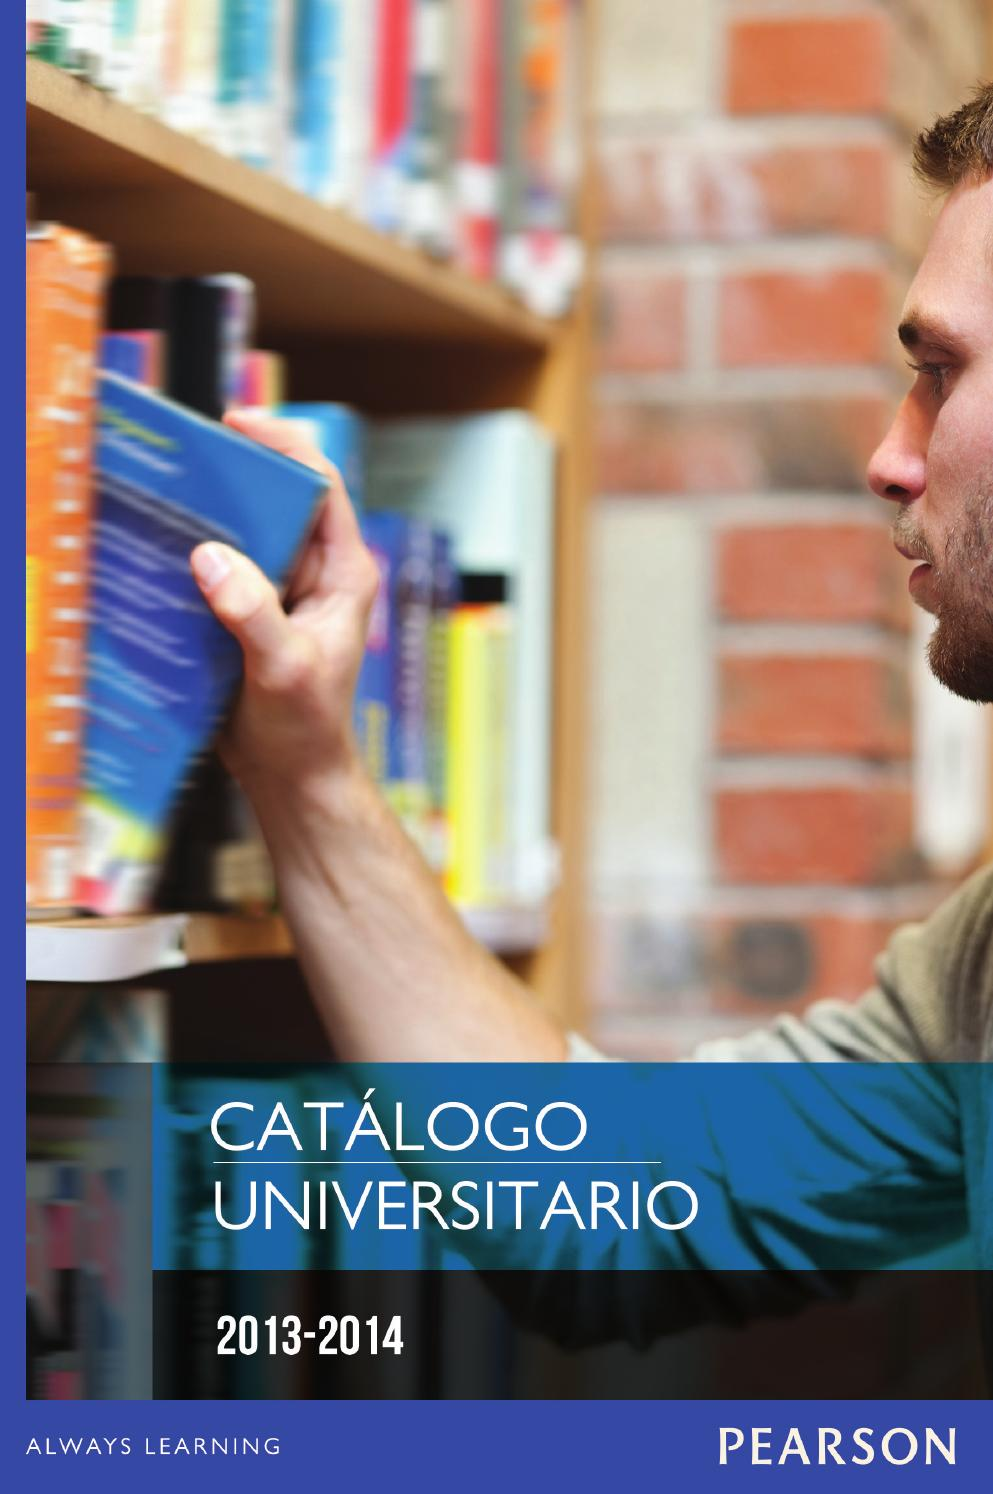 Catalogo Universitario 2013- 2014 by Pearson | México - issuu